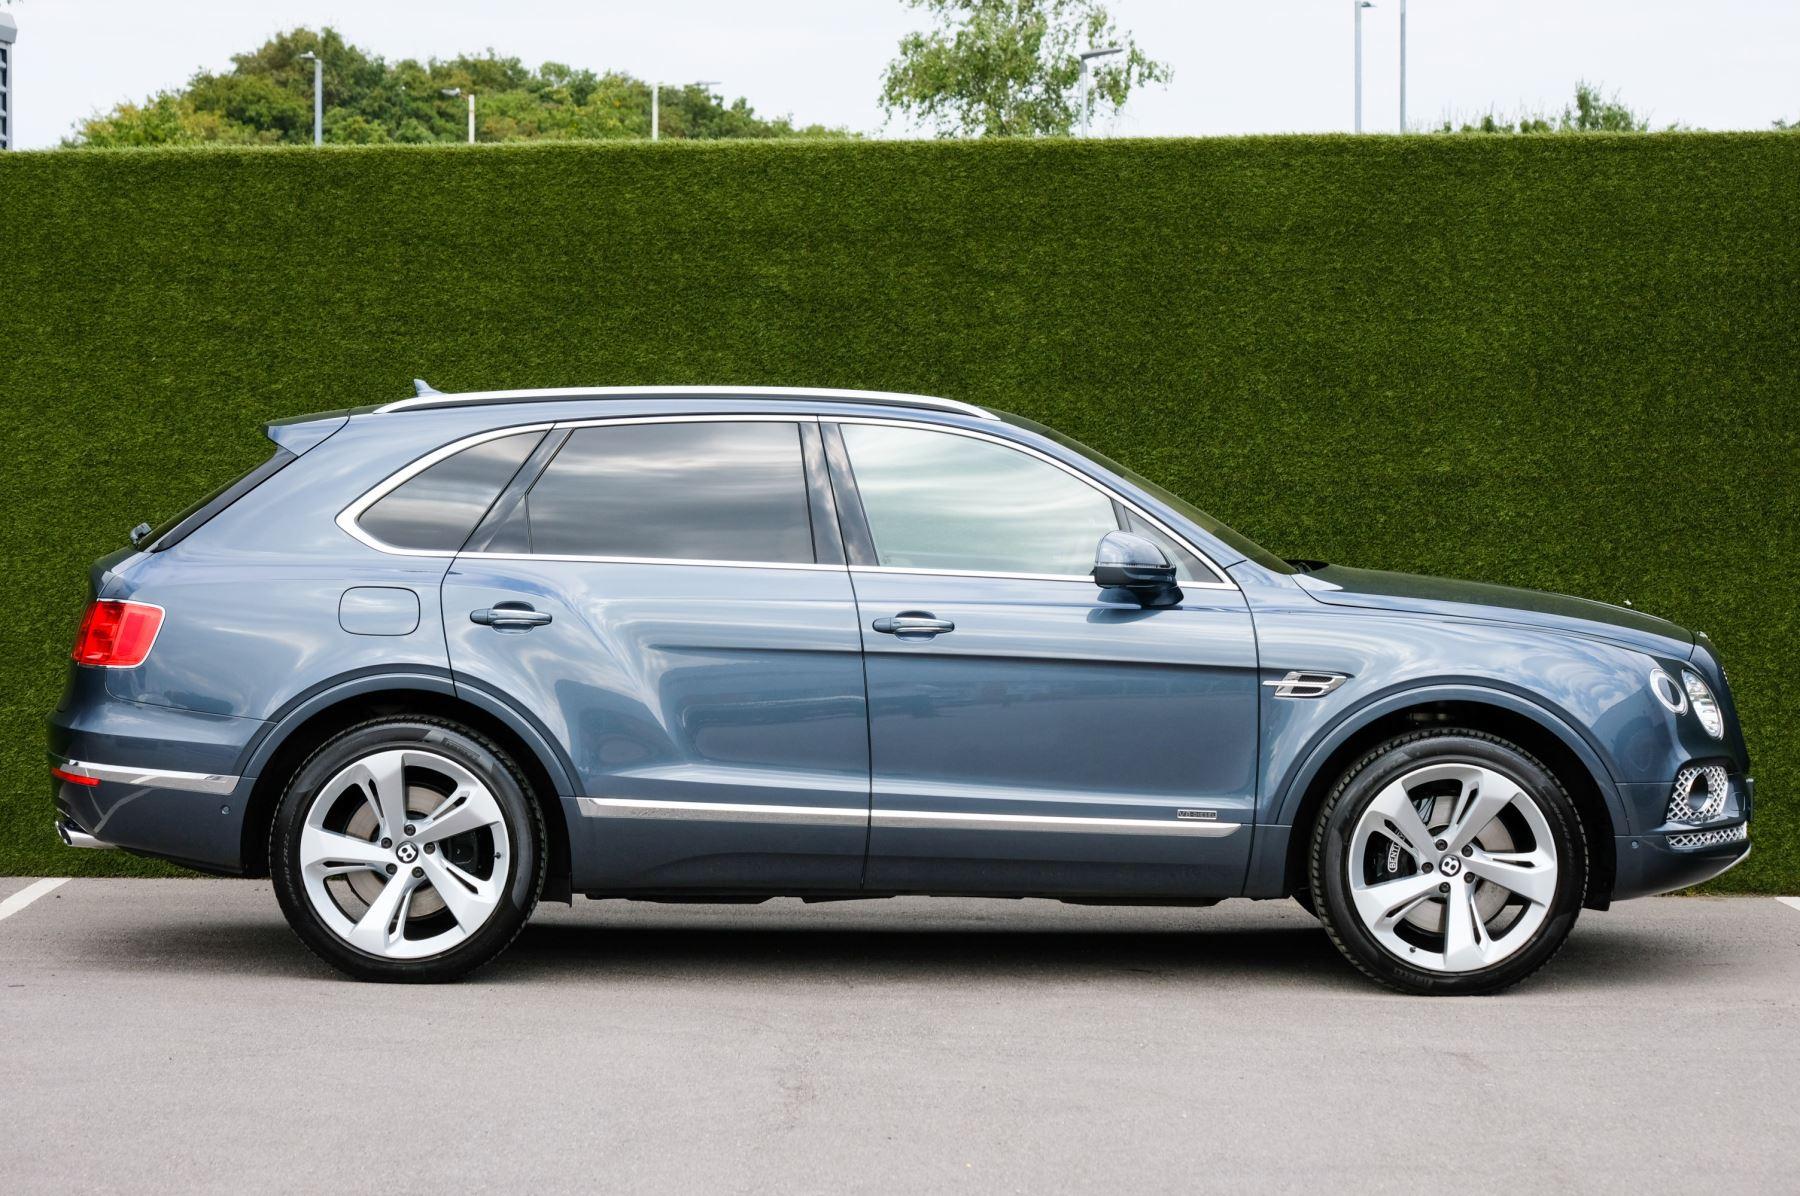 Bentley Bentayga 4.0 V8 5dr - Mulliner Driving Specification - City & Tour Specification image 3